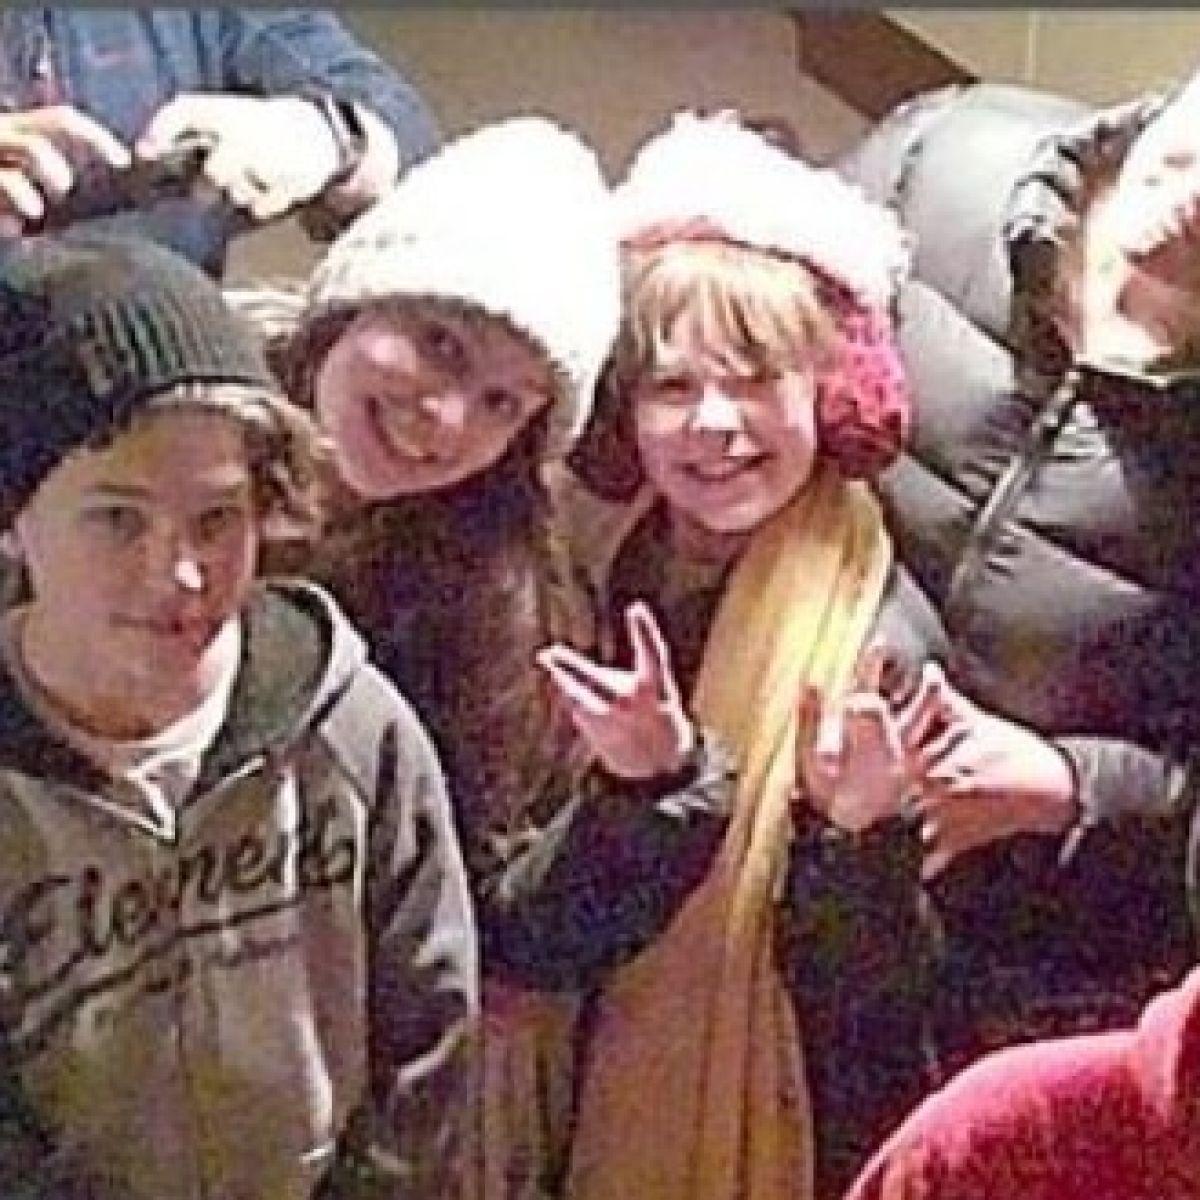 Family 'felt sense of danger' after finding hidden live cam